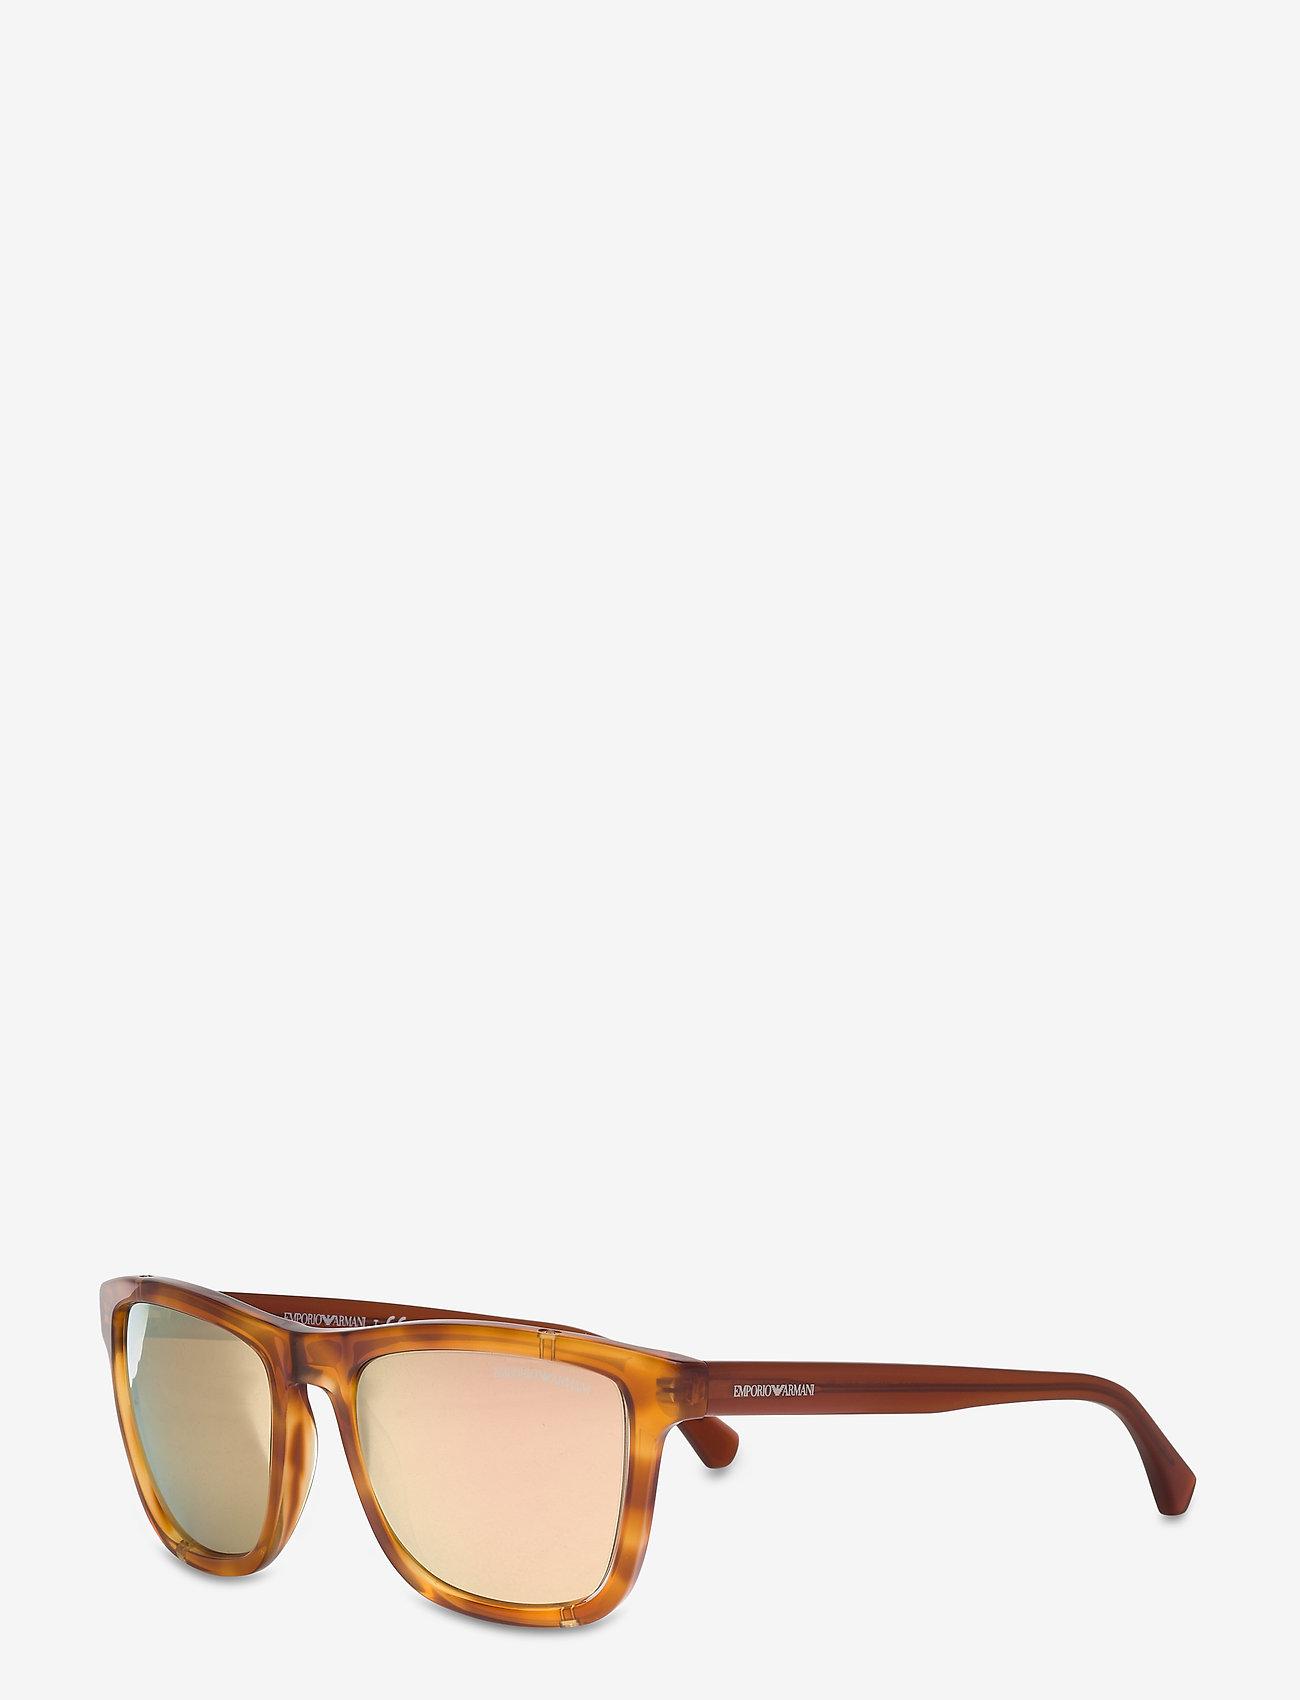 Emporio Armani Sunglasses - 0EA4126 - d-shaped - blonde havana - 1